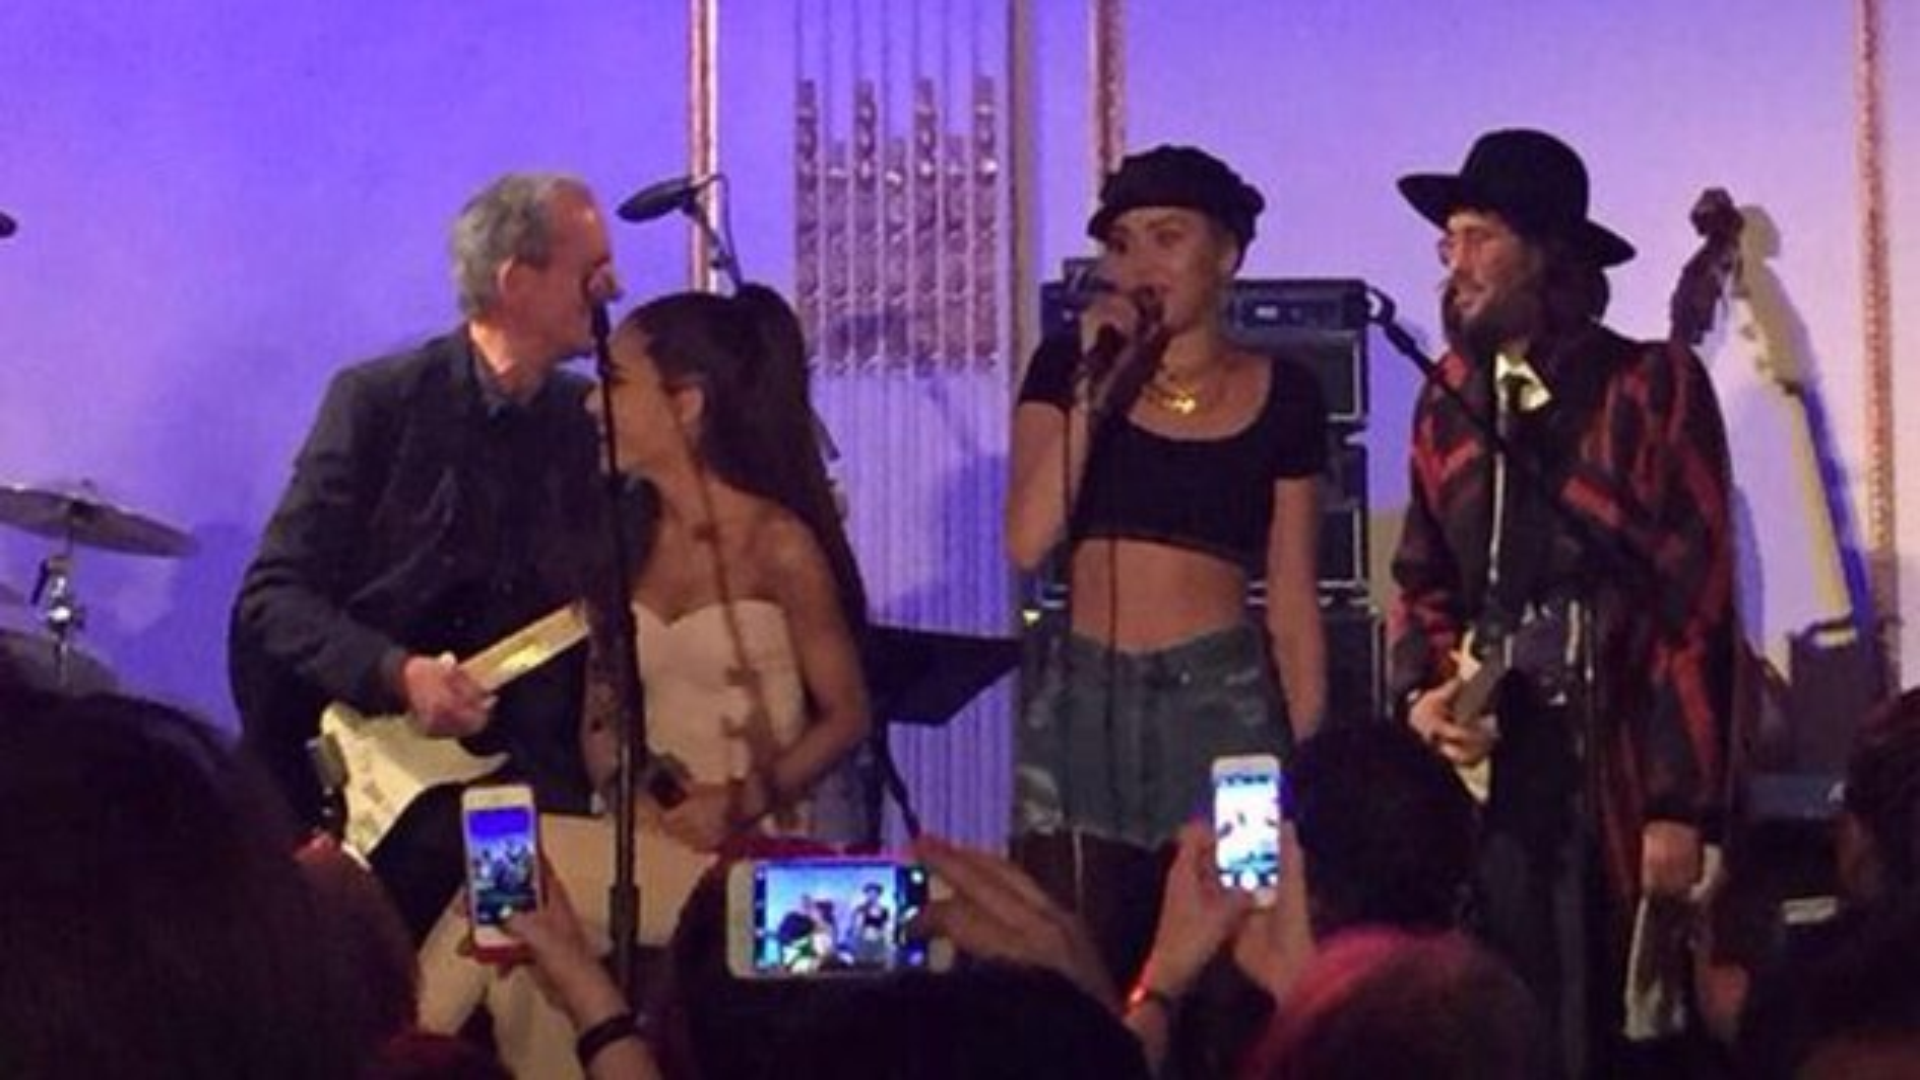 Miley-Cyrus-Ariana-Grande-Saturday-Night-Live